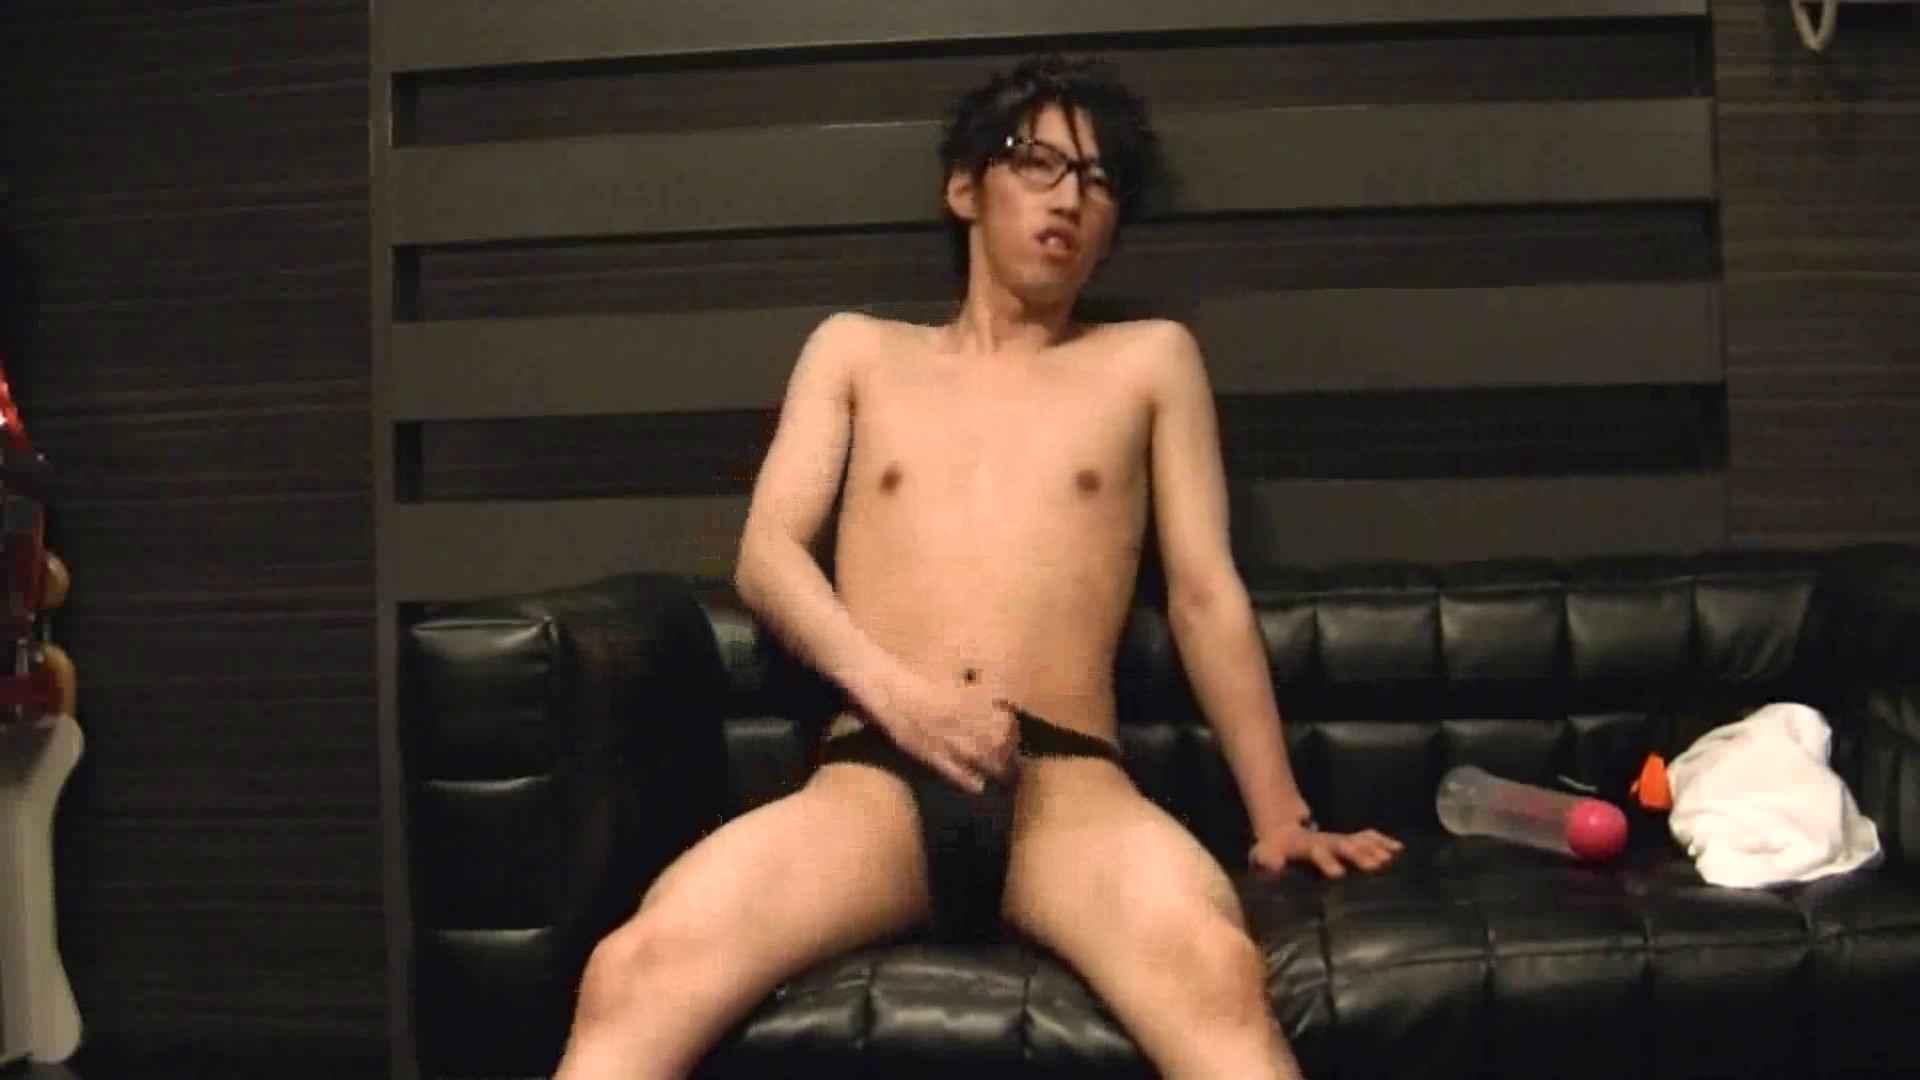 ONA見せカーニバル!! Vol3 男 ゲイ無料無修正画像 89枚 51